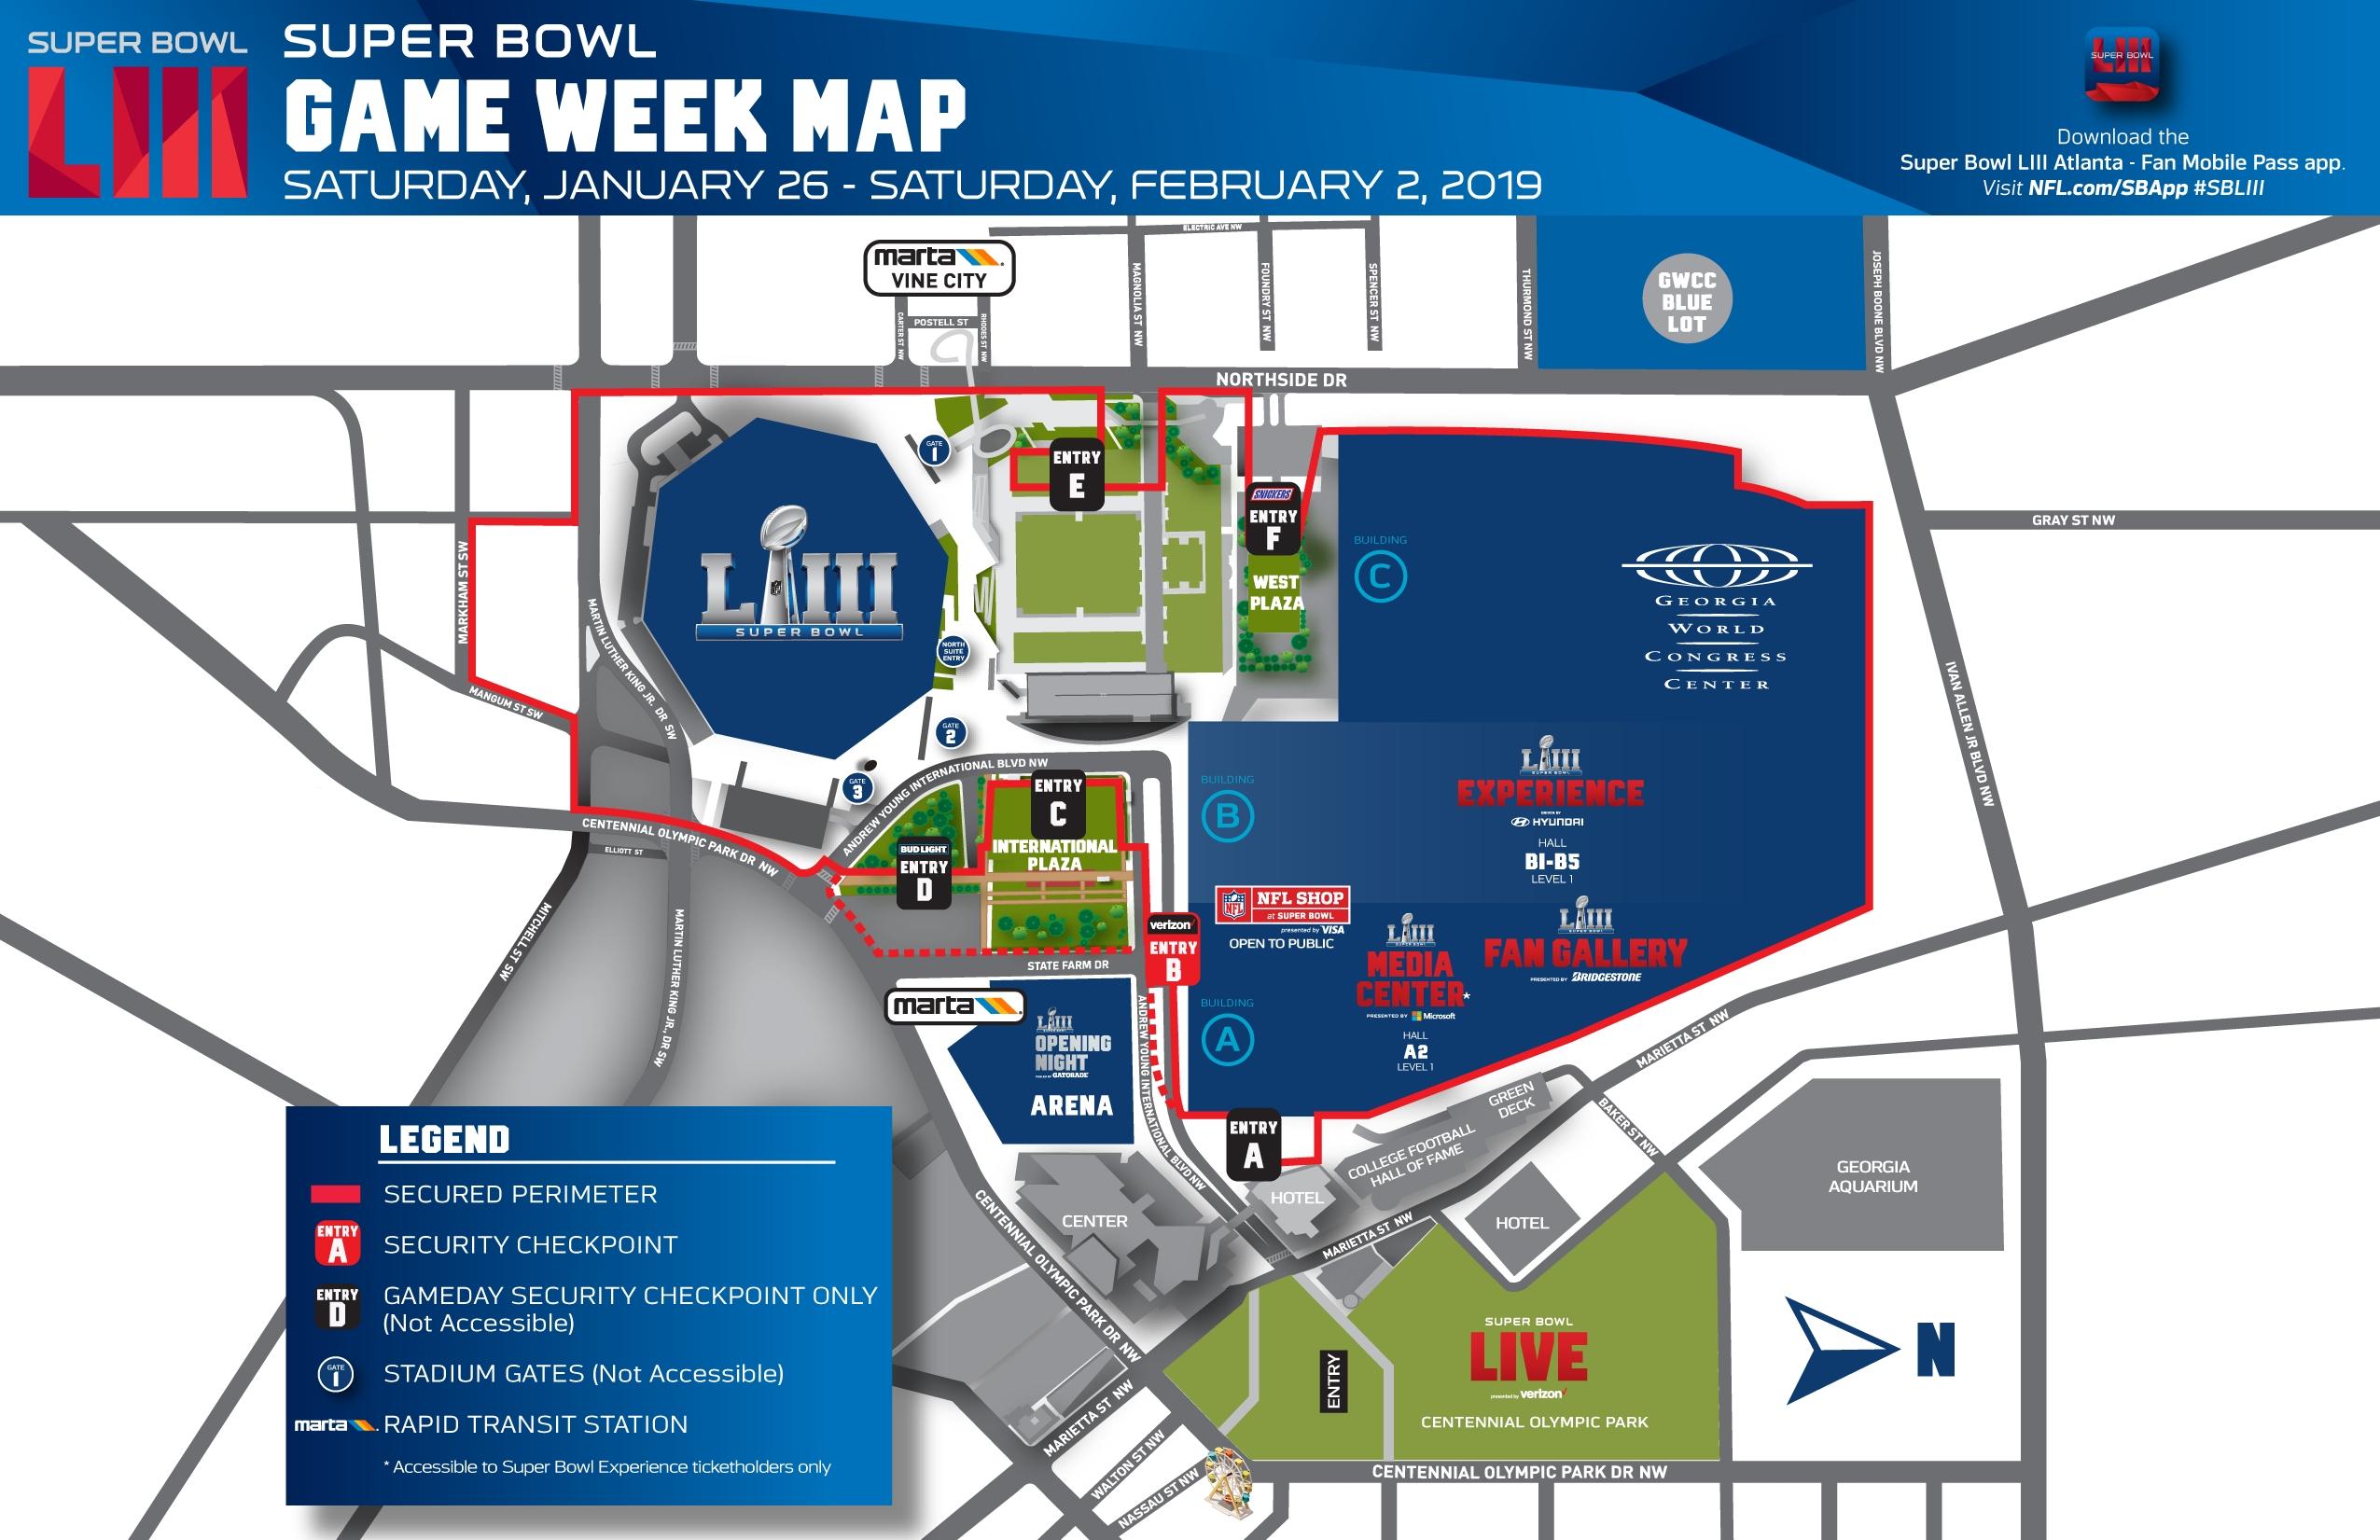 Super Bowl Hub - Mercedes Benz Stadium pertaining to Super Bowl Liii Fan Map